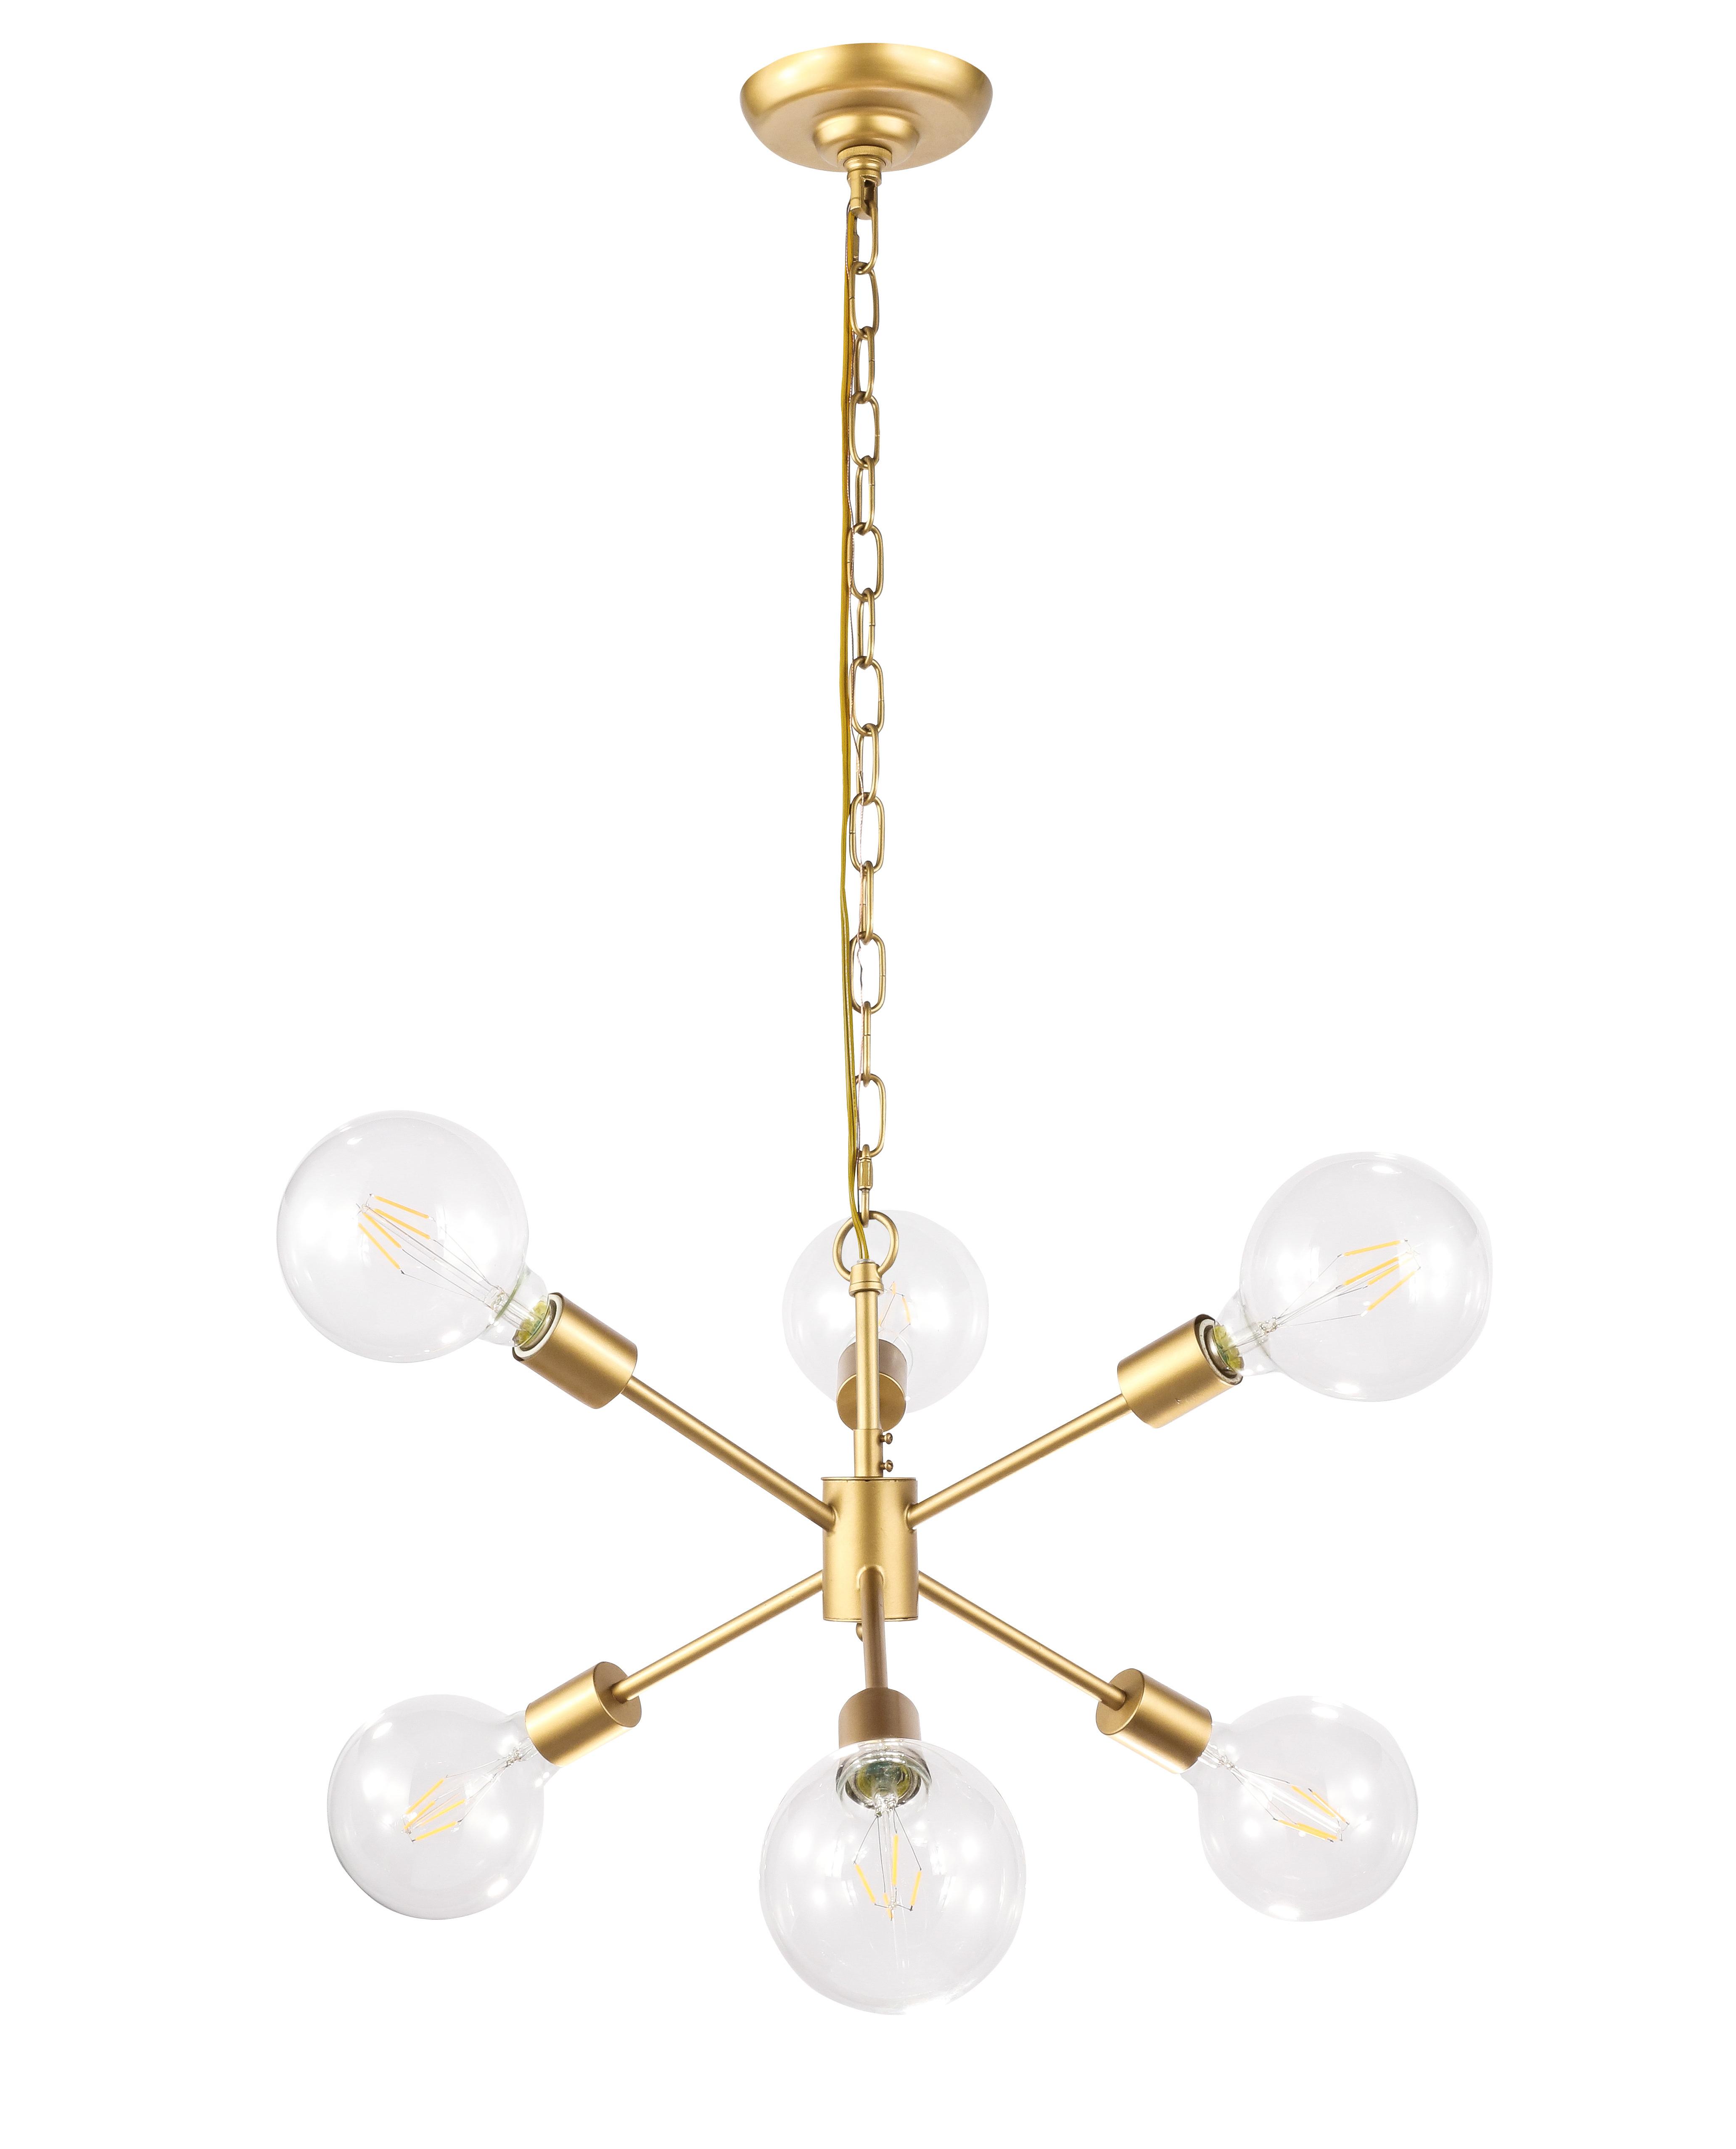 Most Recently Released Velva 6 Light Sputnik Chandelier Throughout Johanne 6 Light Sputnik Chandeliers (Gallery 9 of 20)